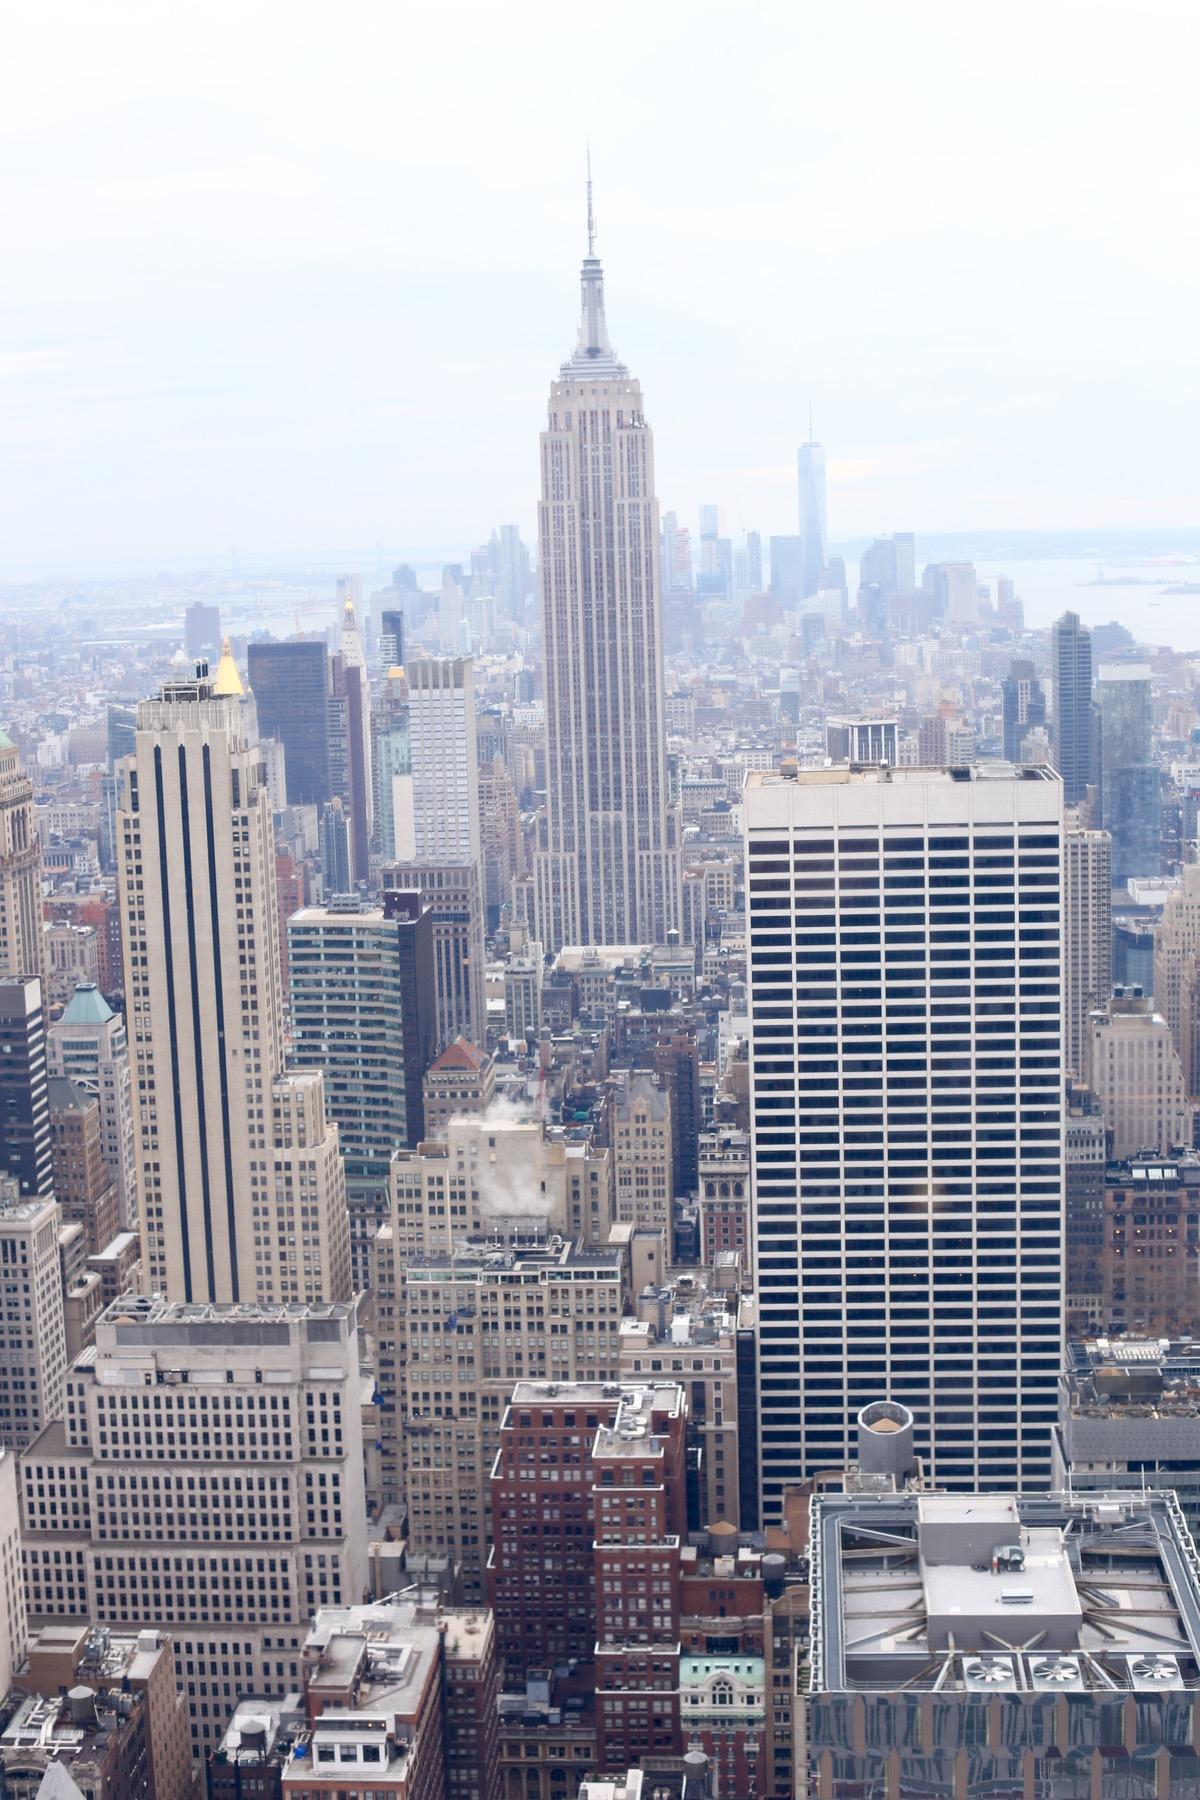 new york city skyline, top of the rock - @mystylevita - 1